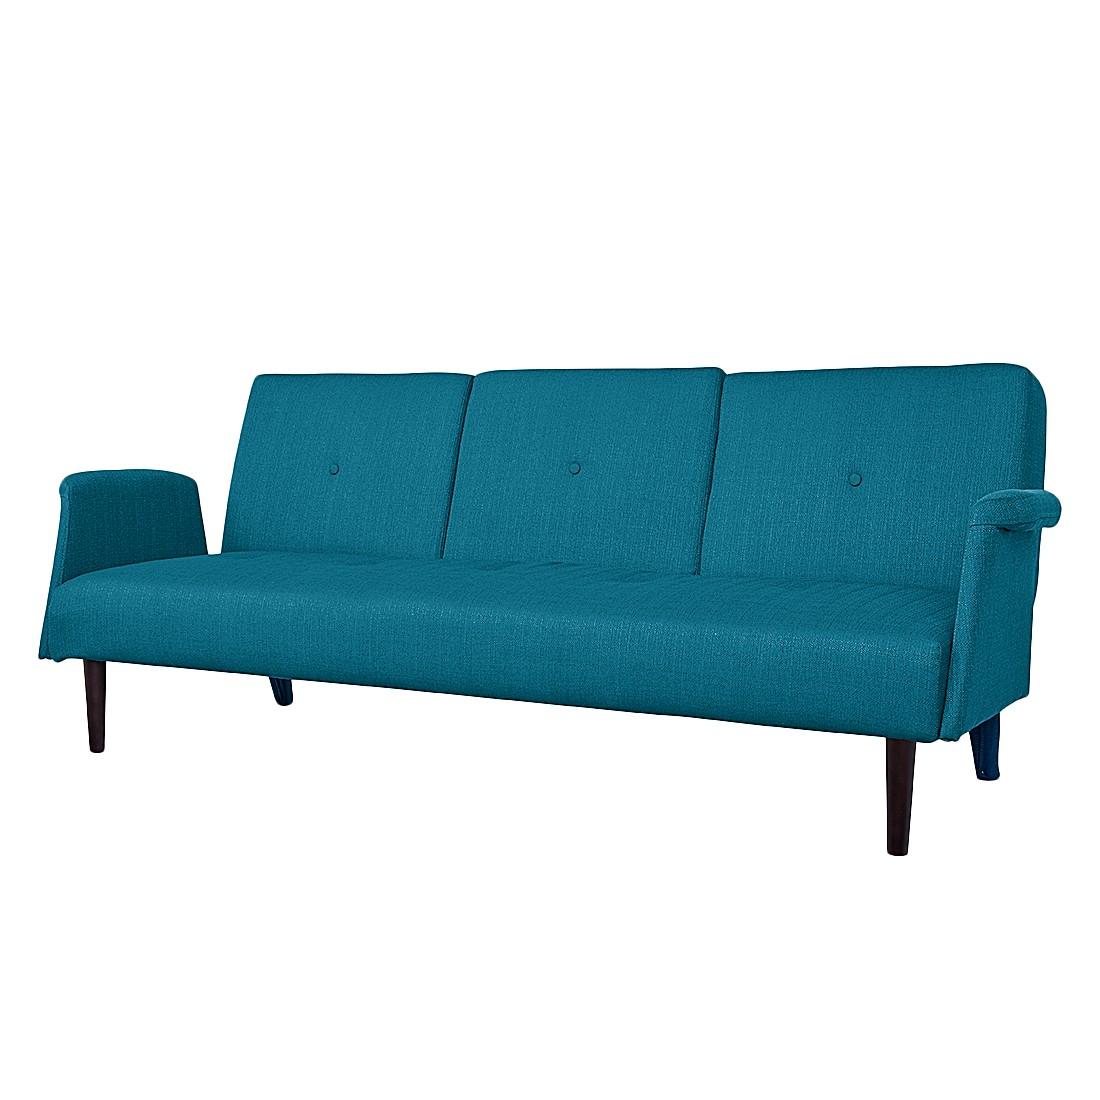 Canapé convertible Mads - Tissu bleu, Morteens